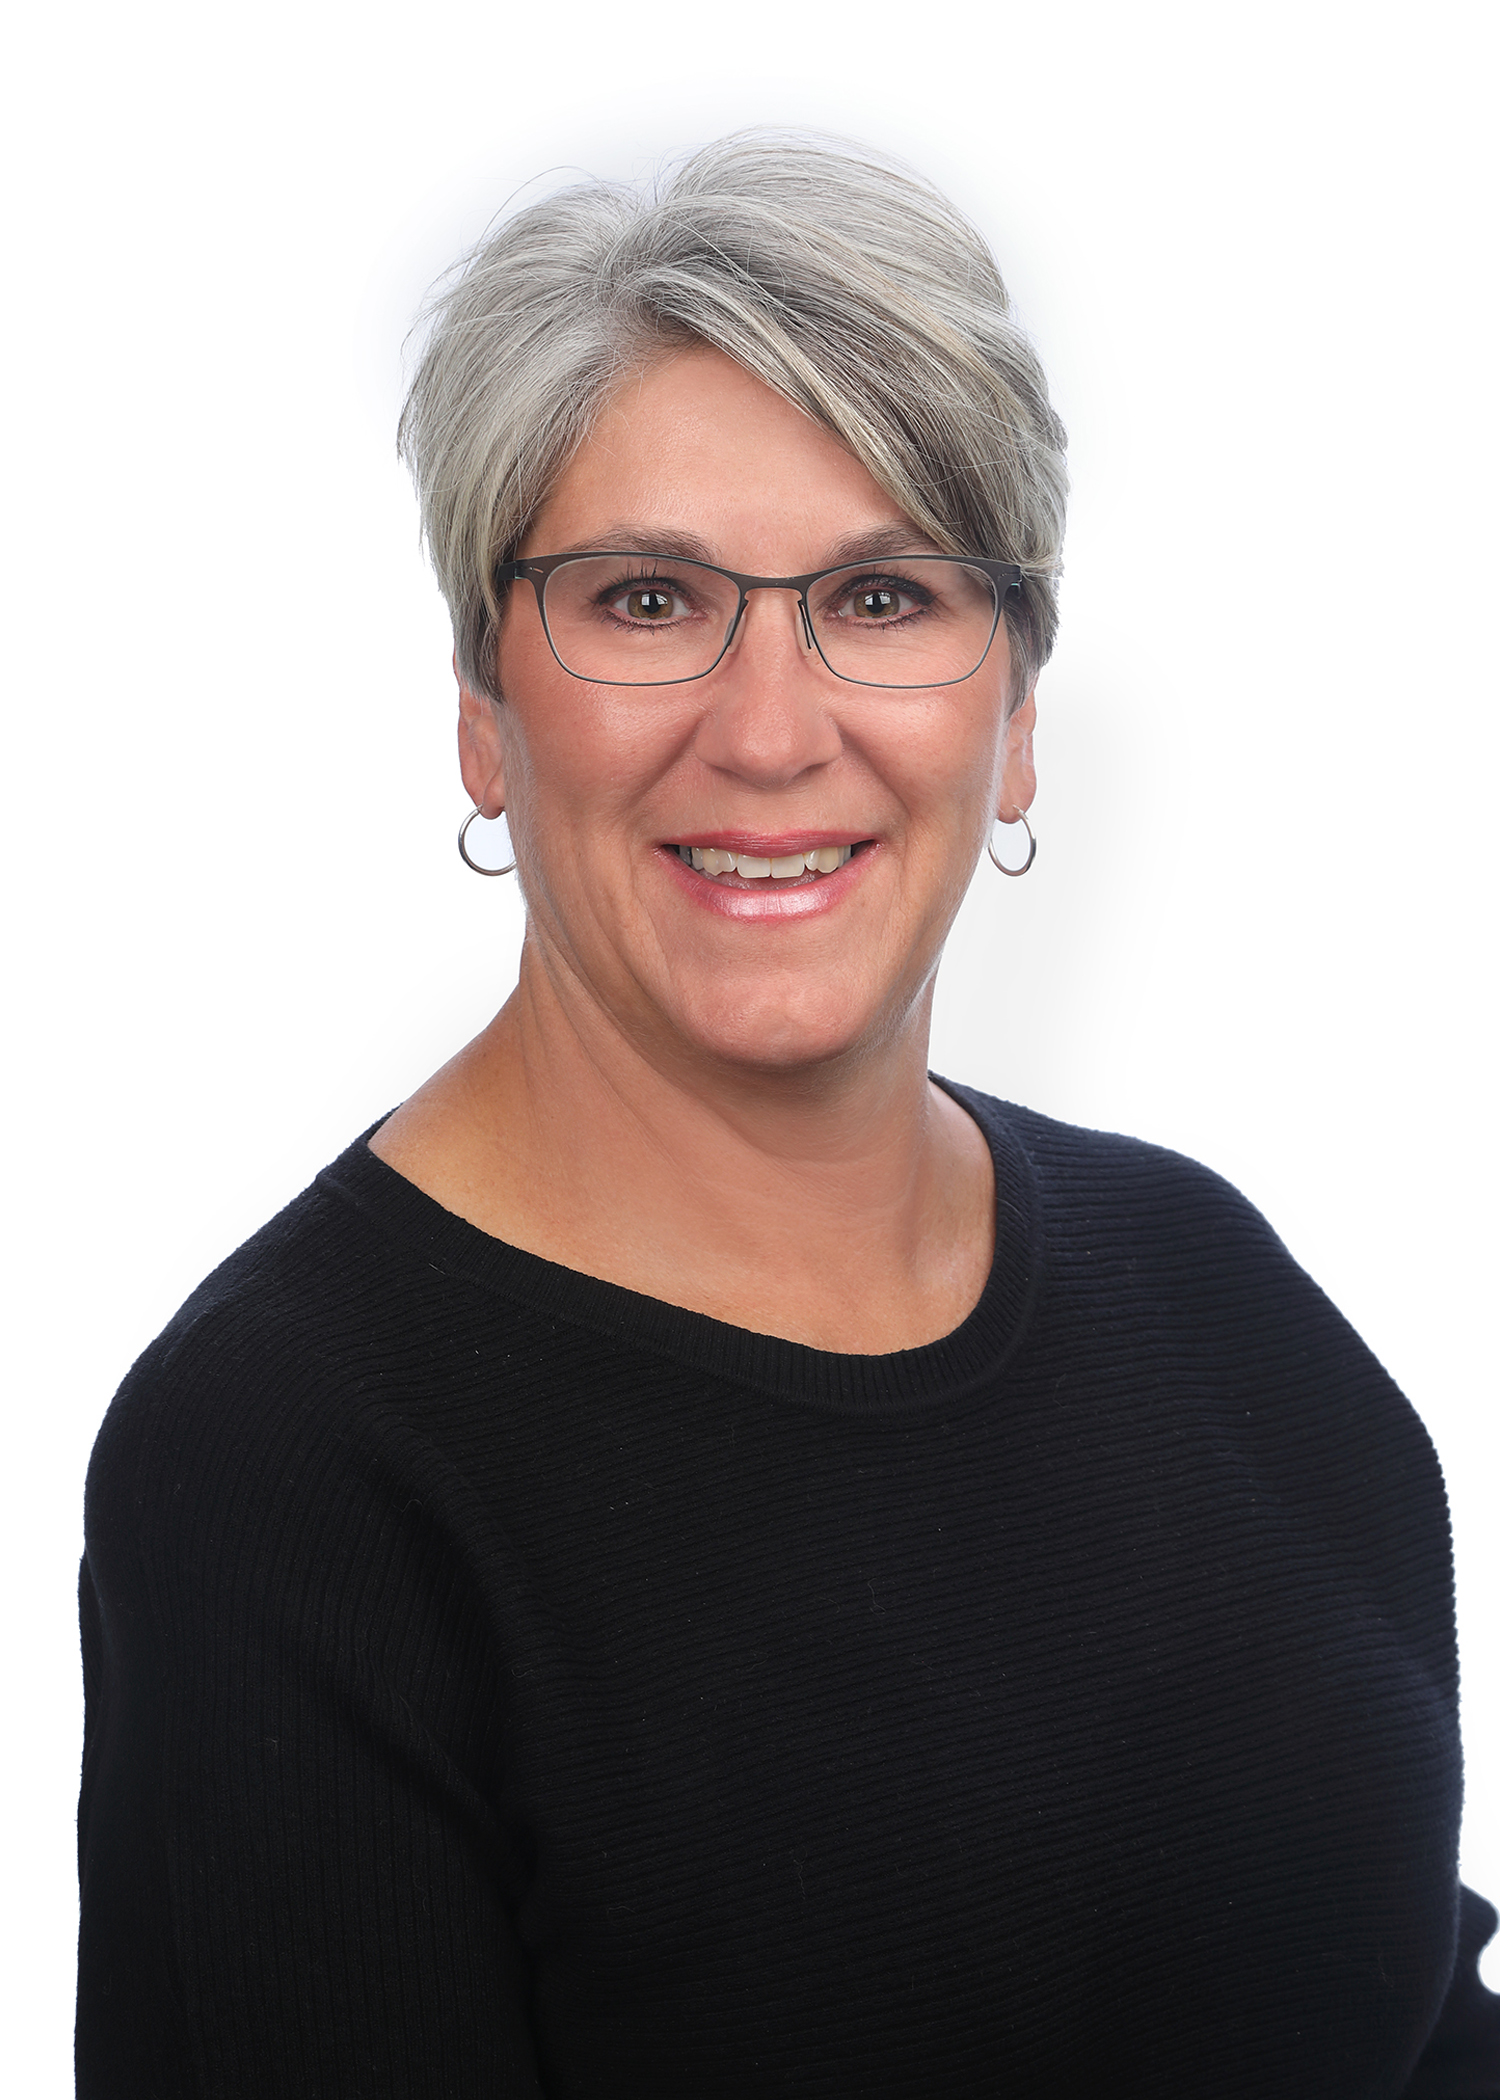 Kimberly Strom